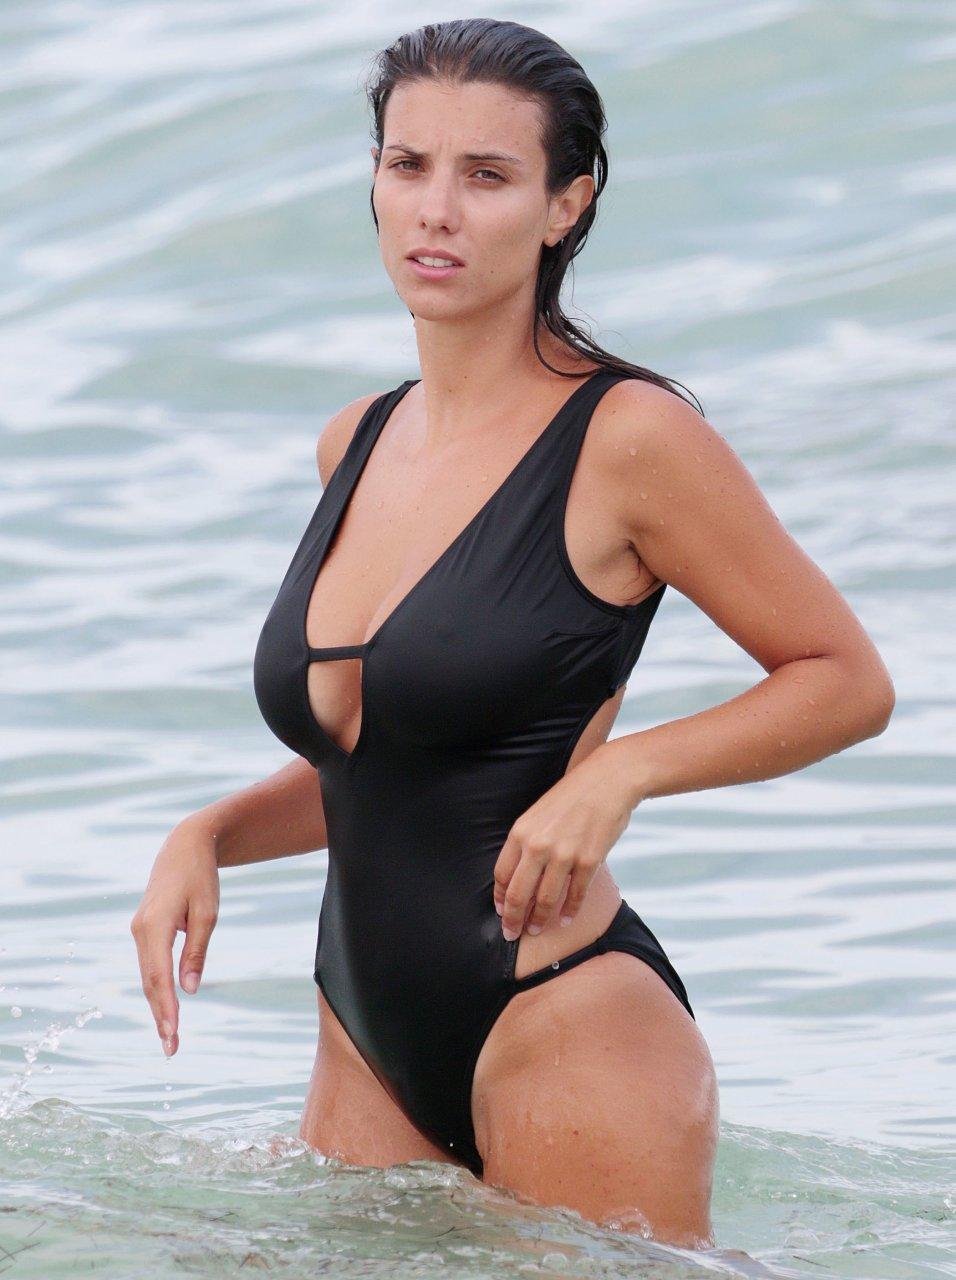 Ludivine sagna tits nudes (97 photos), Topless Celebrity photos